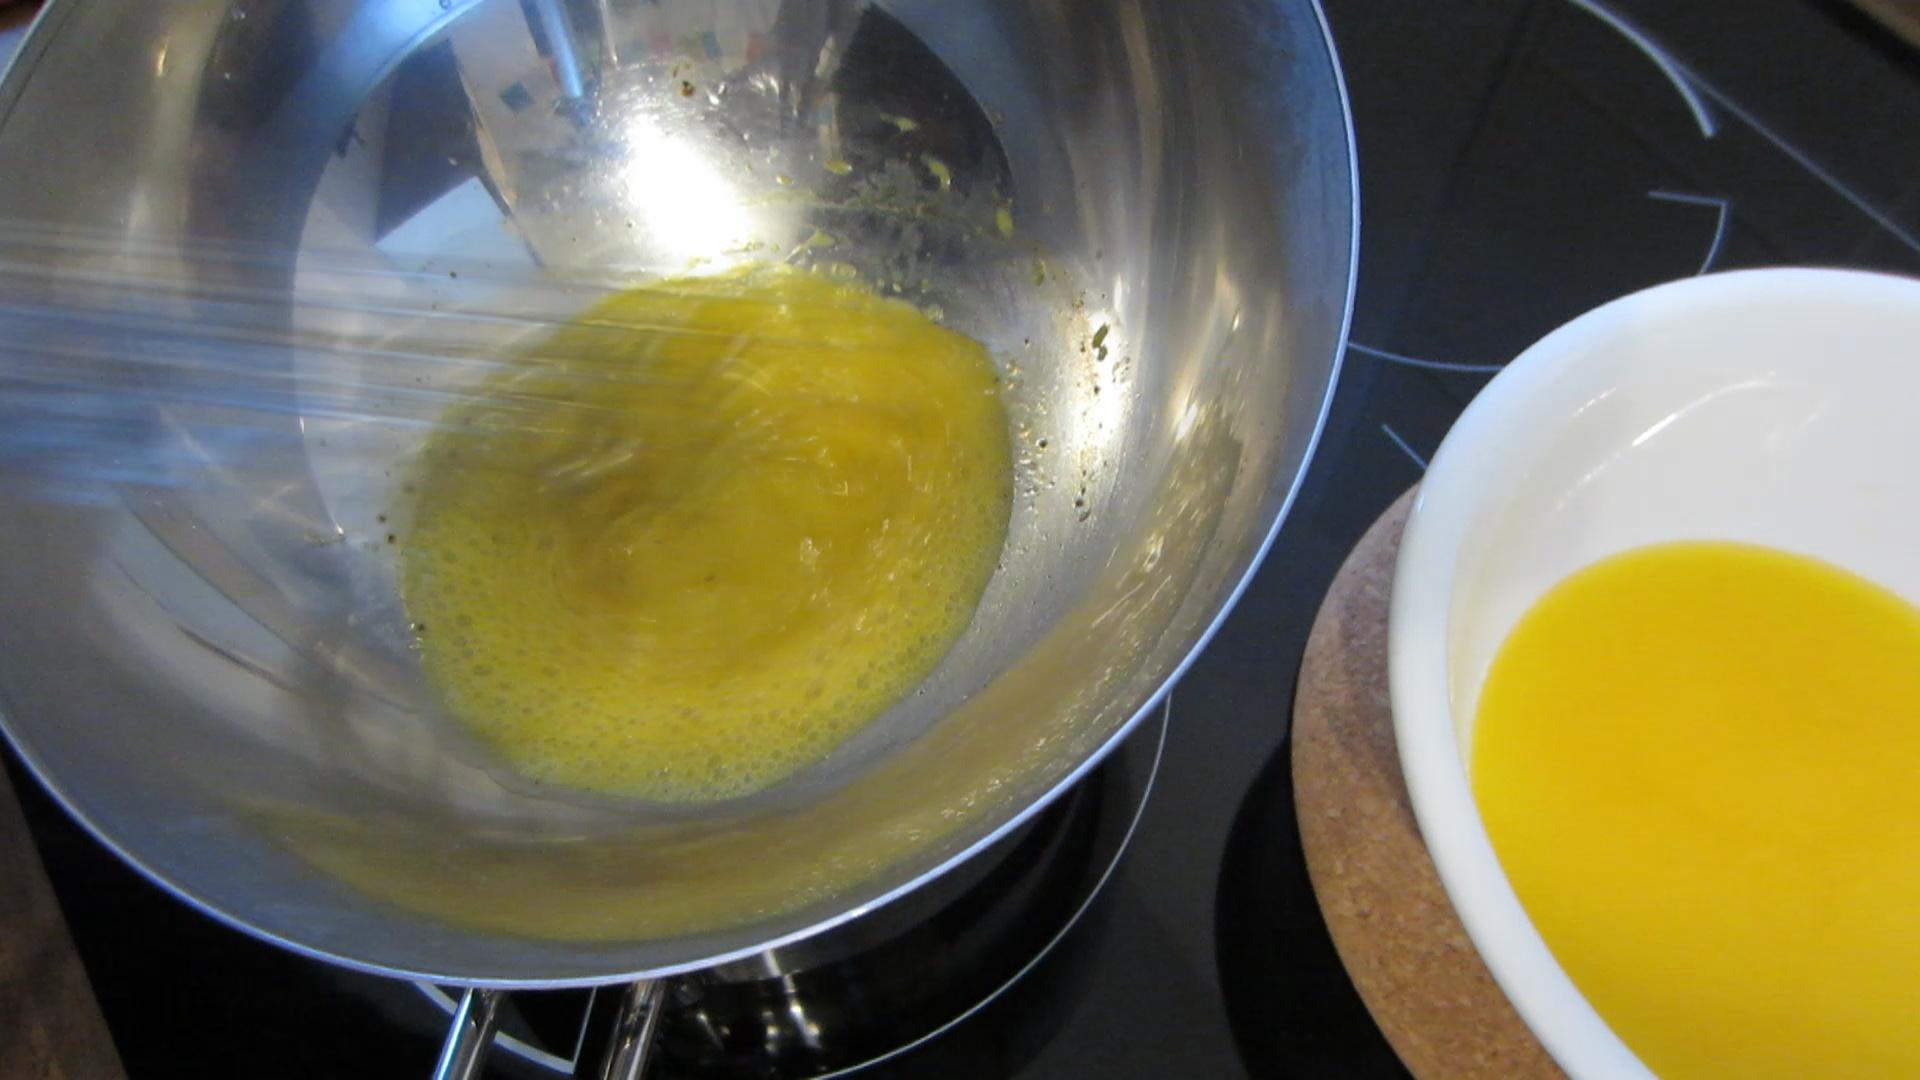 2014-04-25-Grüner-Spargel-mit-homemade-Sauce-hollandaise-12.jpg